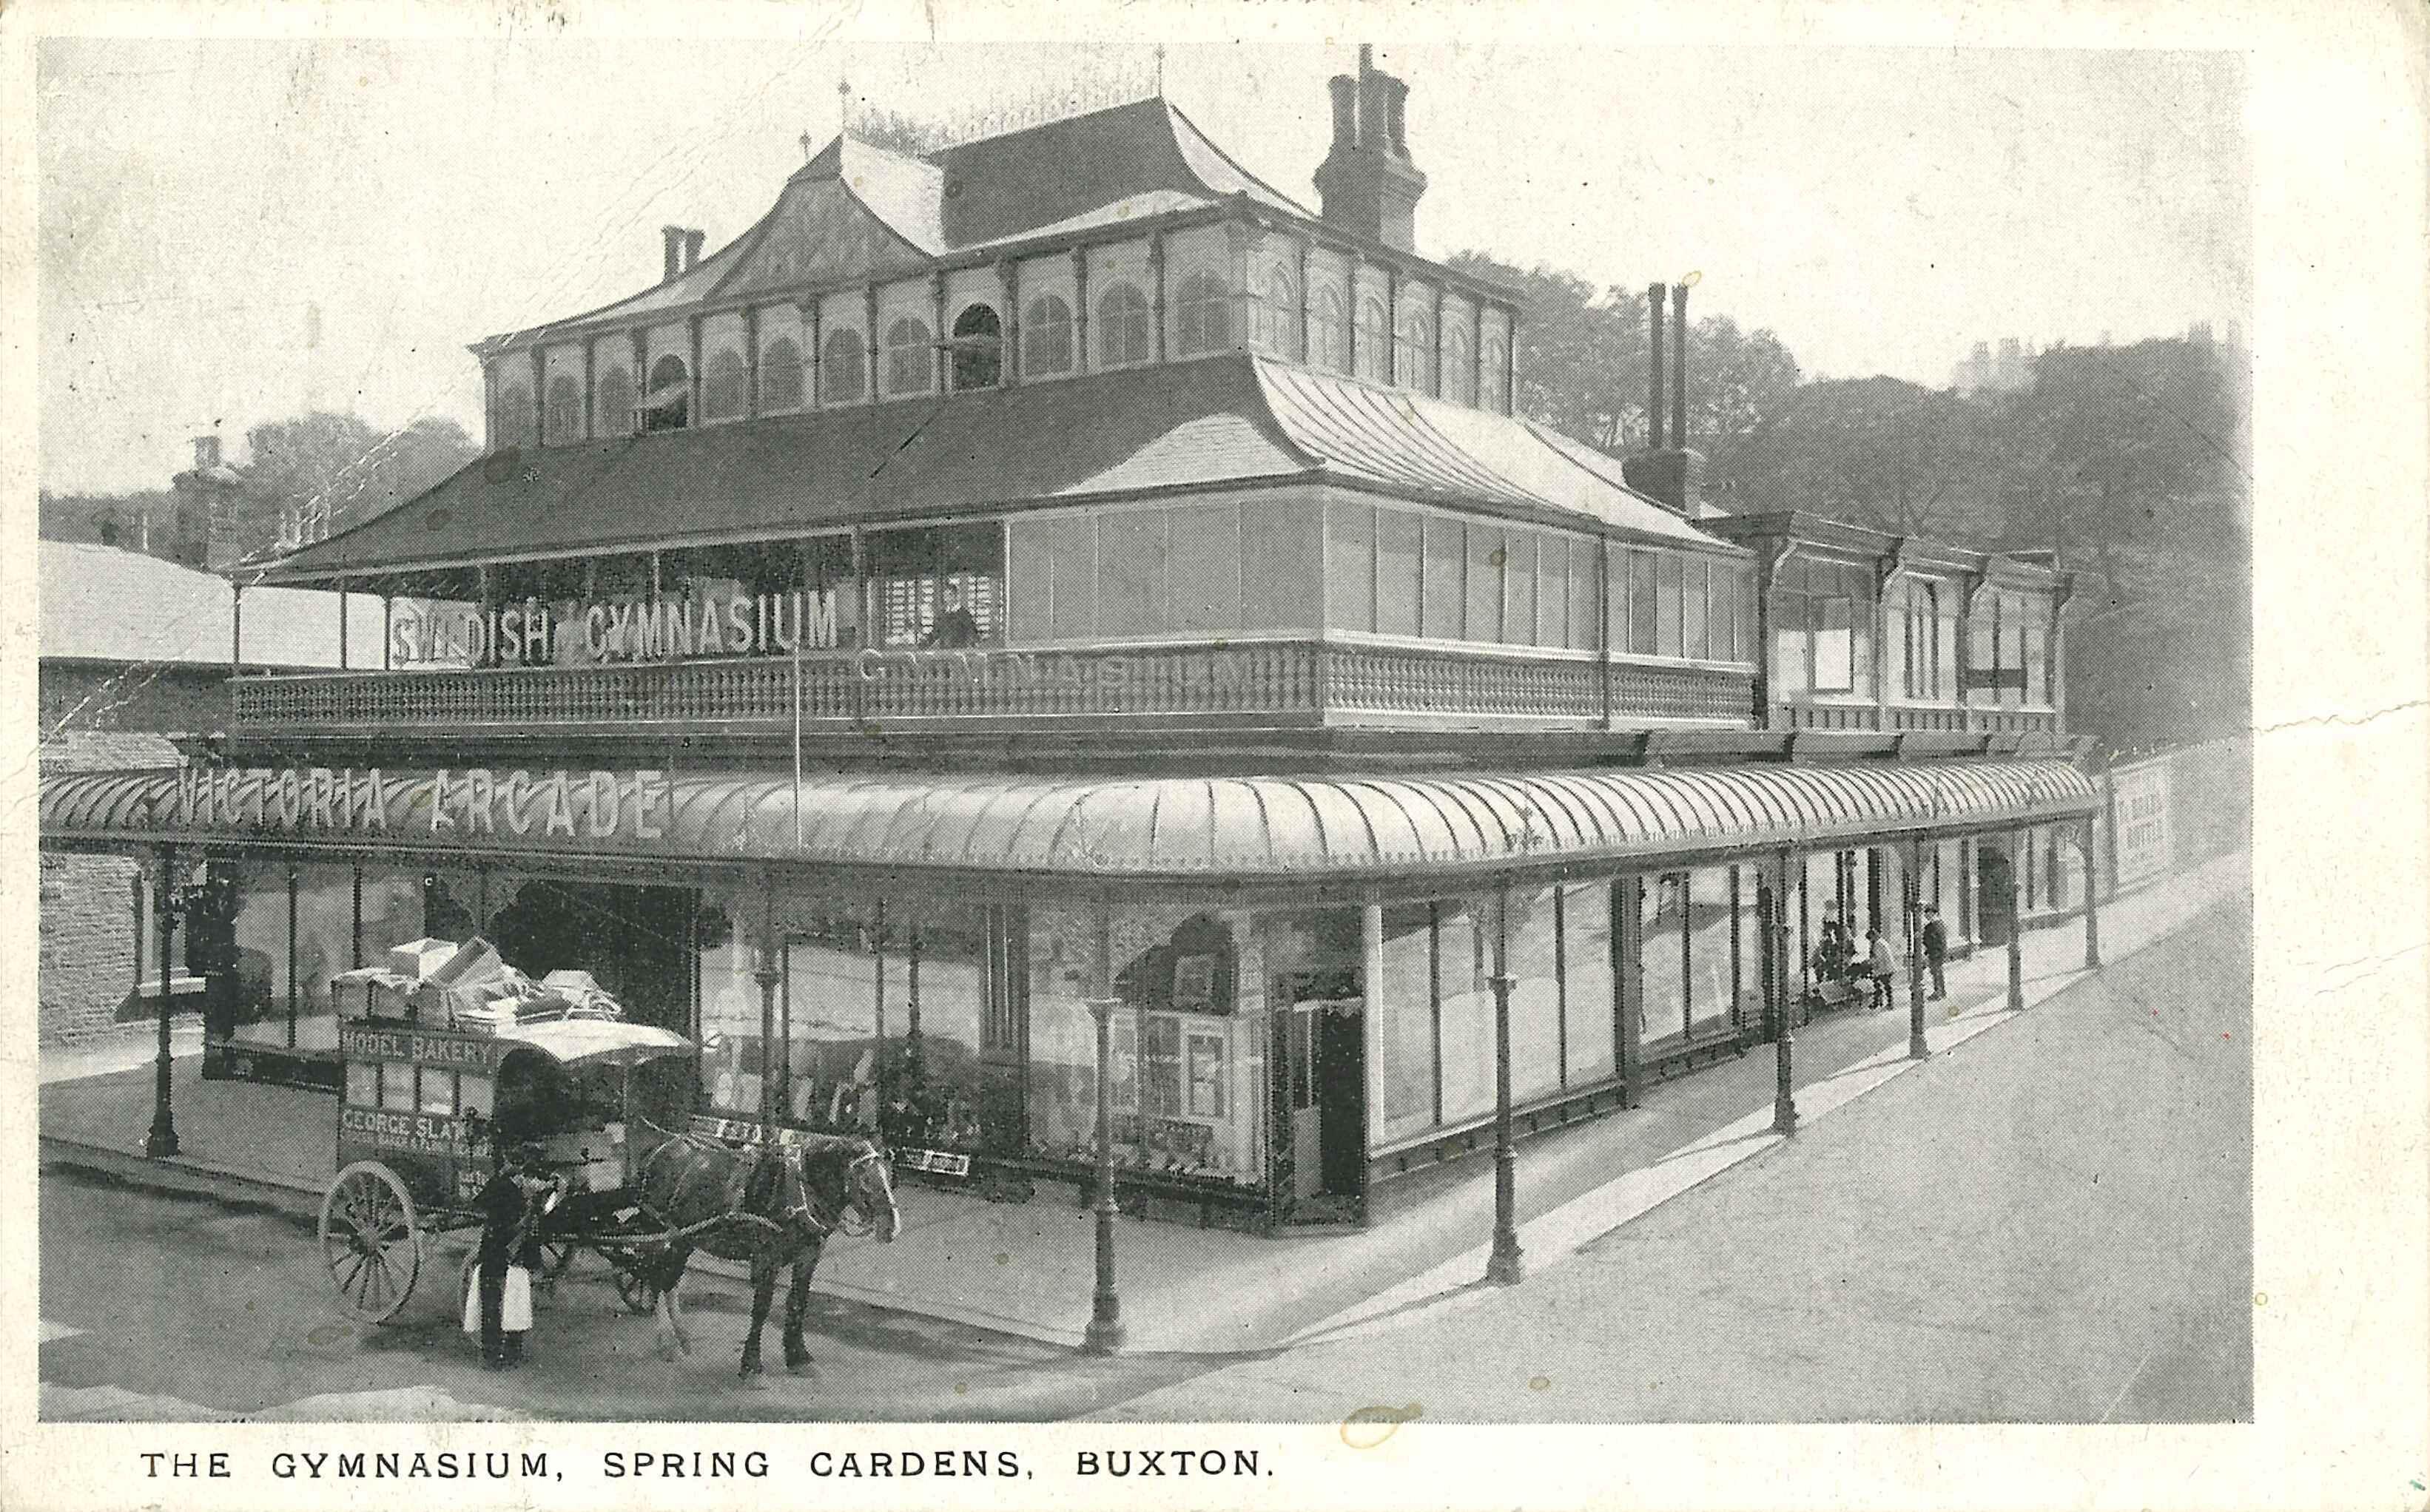 Postcard featuring the Swedish Gymnasium on Victoria Arcade, Spring Gardens, Buxton. Postmarked Buxton January 15th 1912.